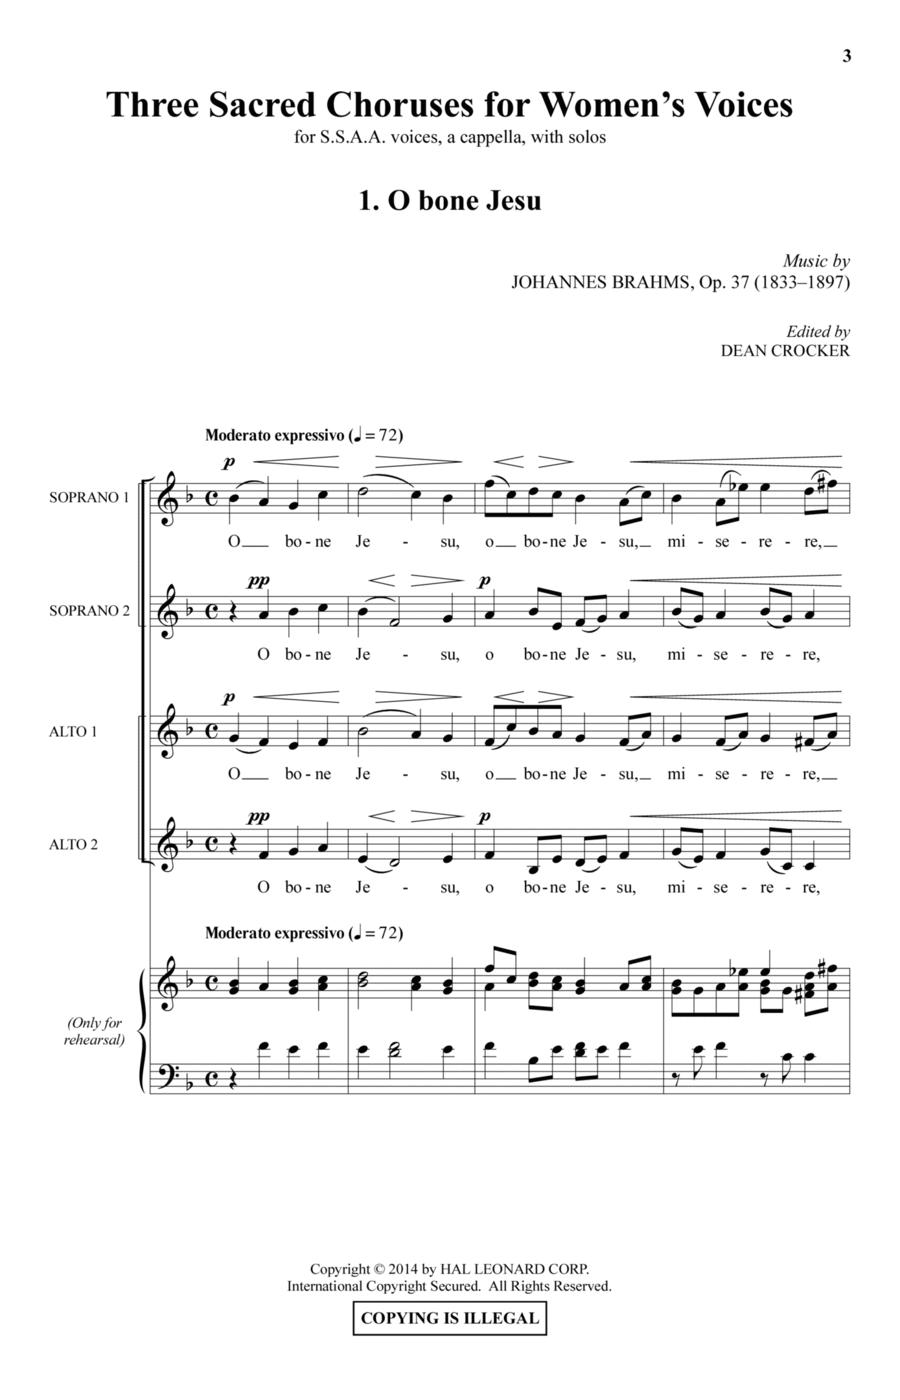 Three Sacred Choruses For Women's Voices